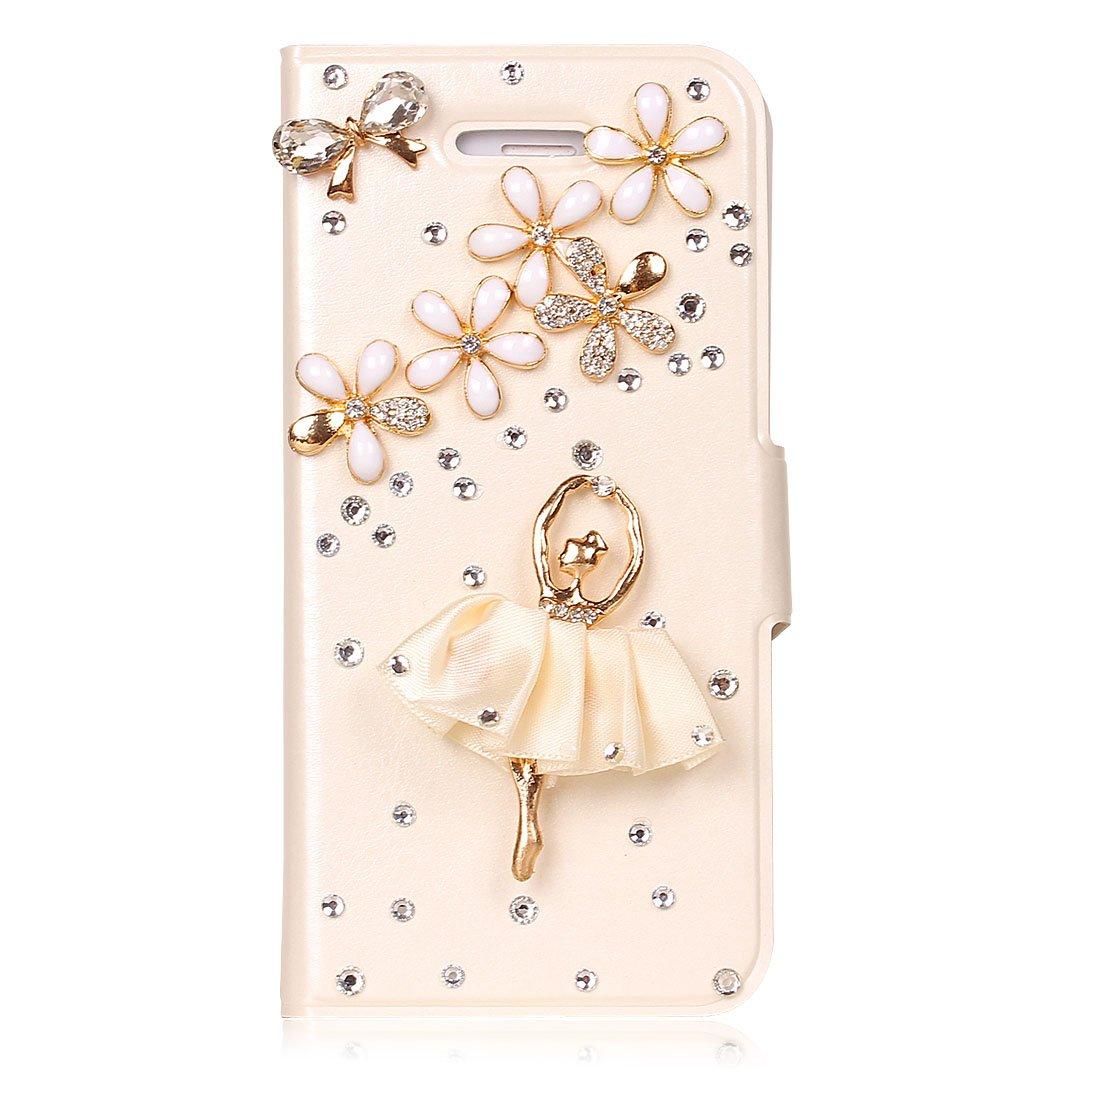 yidaou苹果5手机壳皮套iphone5保护套可爱iphone5手机壳纸袋女折口水钻图片